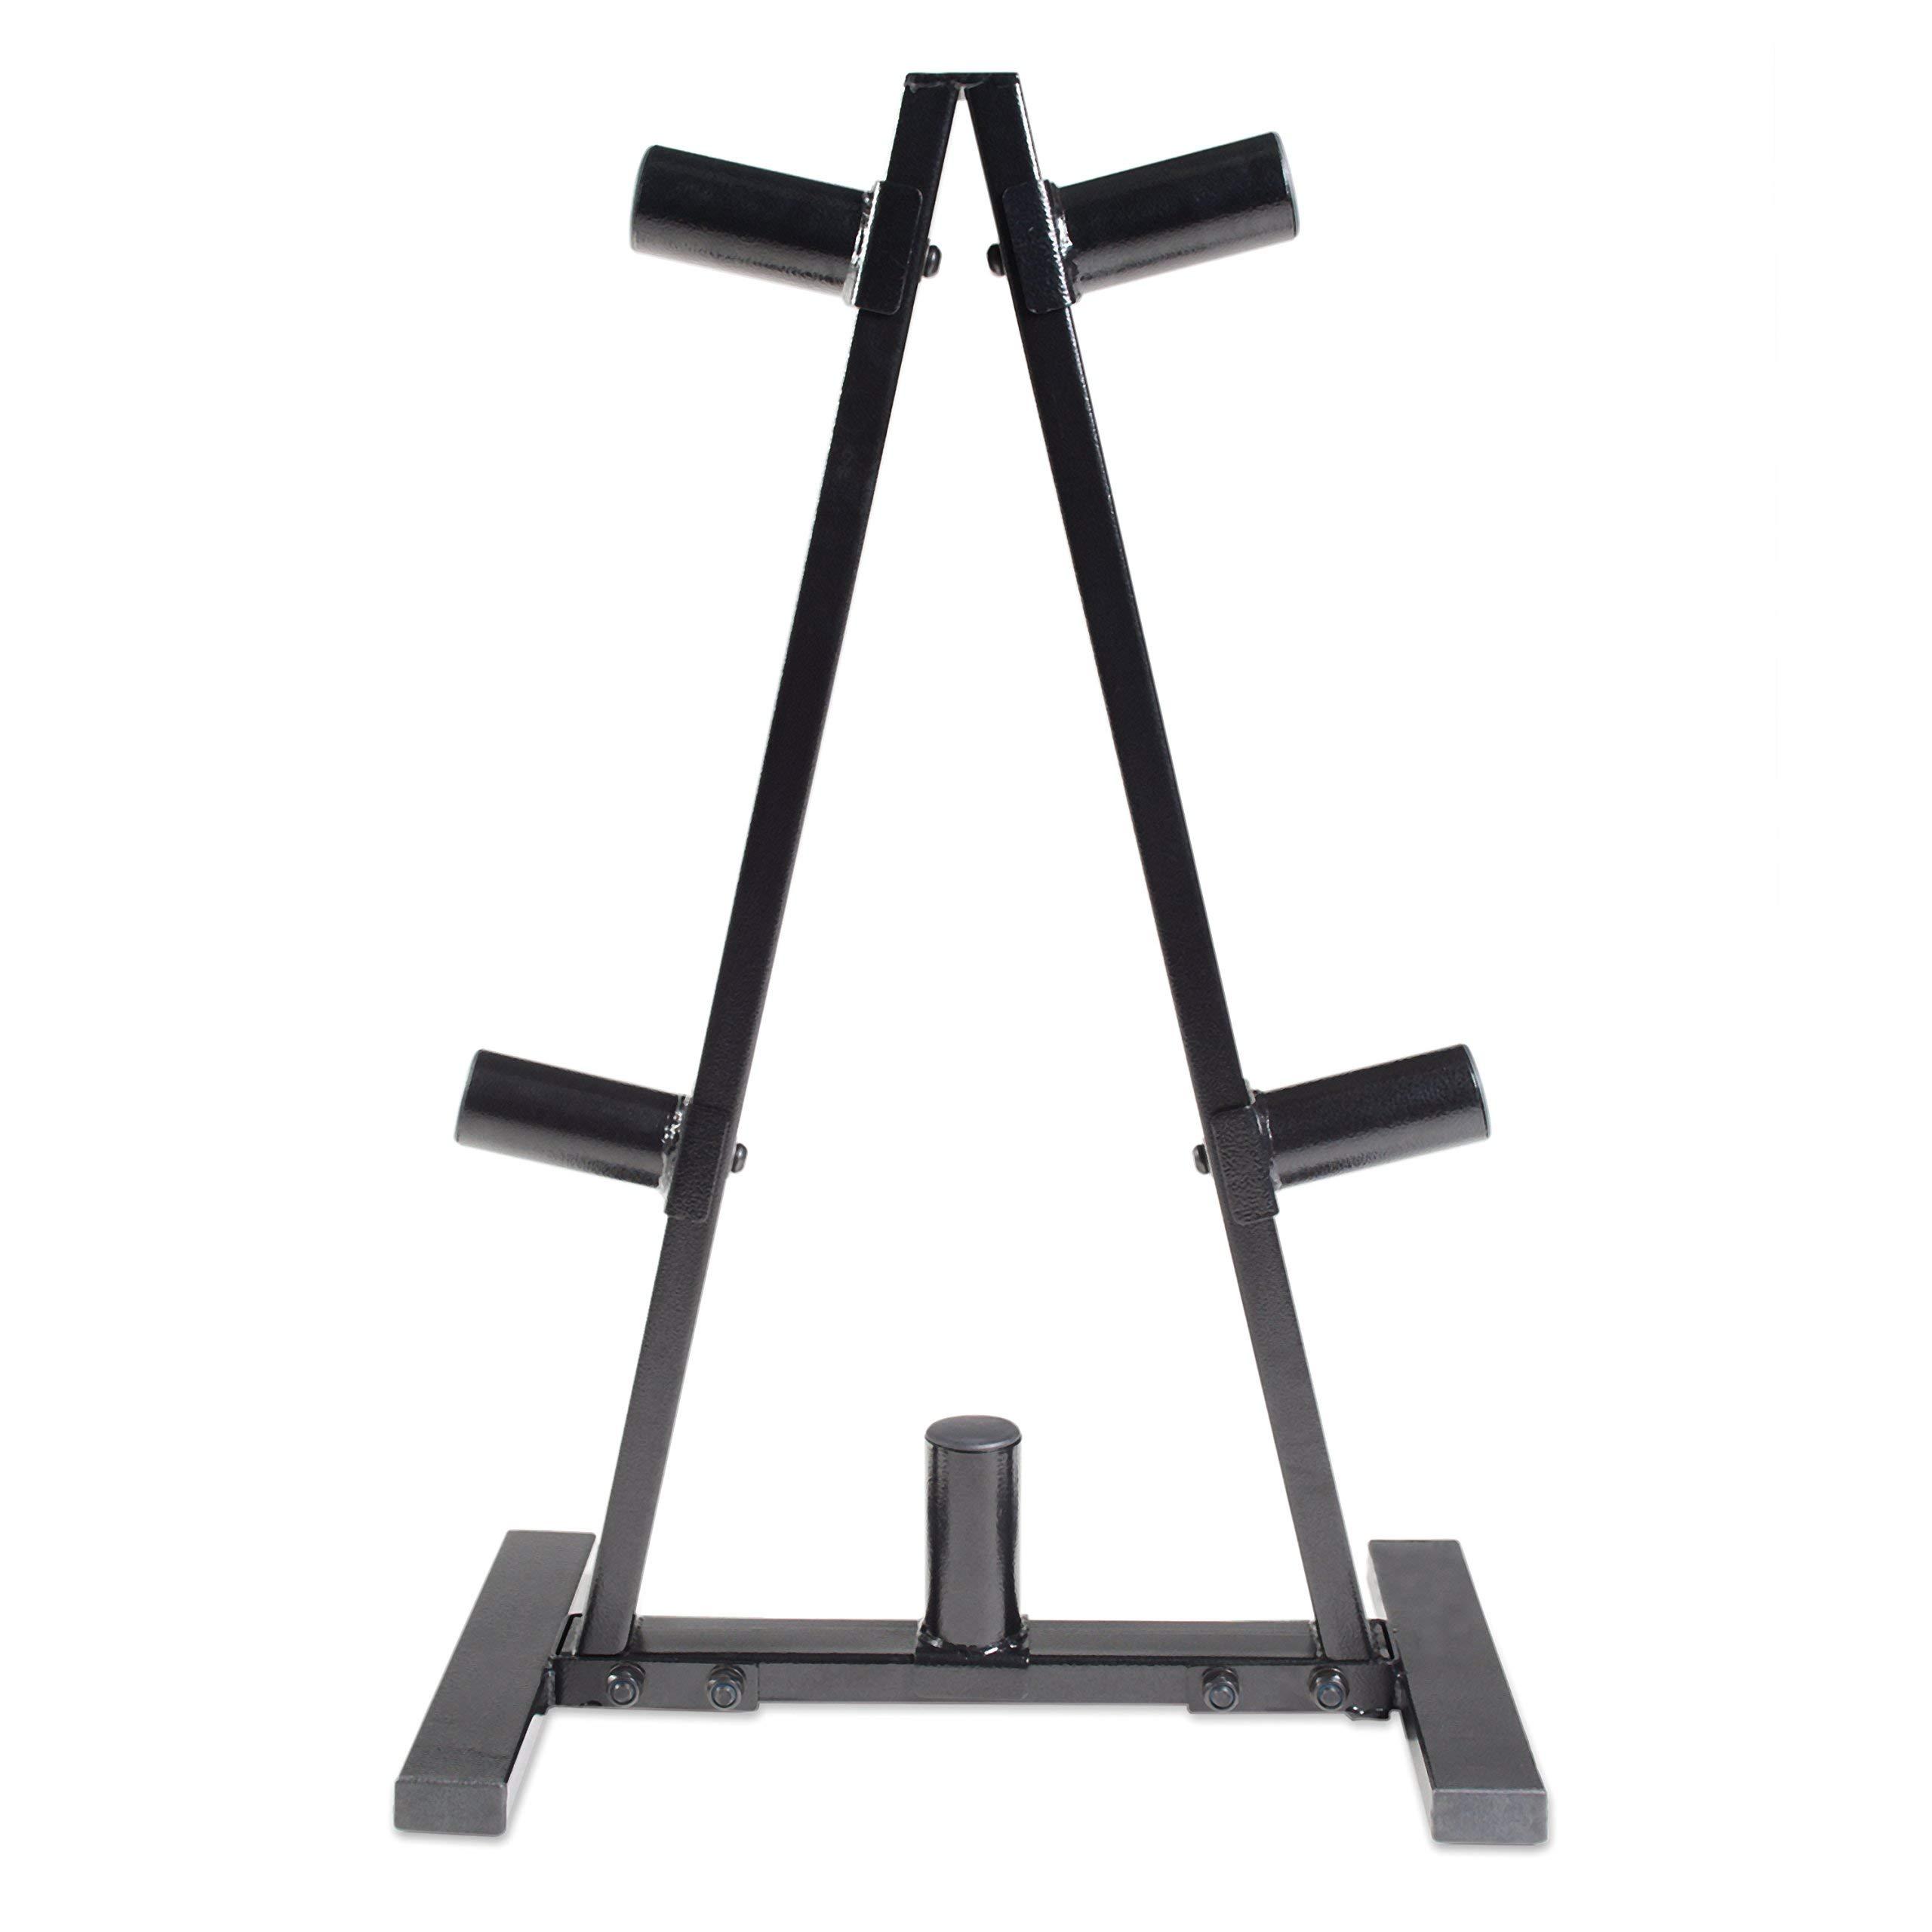 CAP Barbell A Frame Olympic Plate Rack, Dark Gray (Renewed)